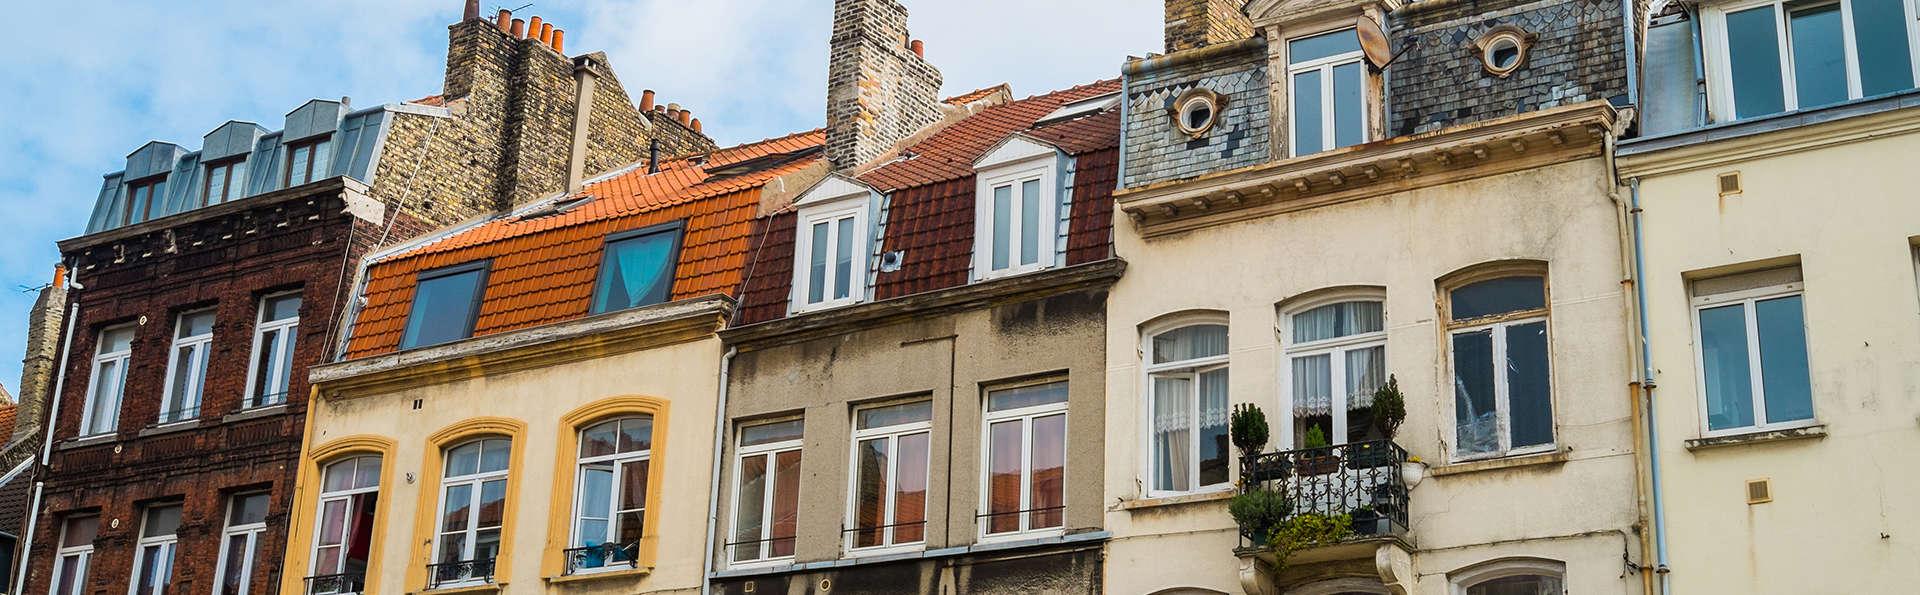 QUALITY HOTEL DUNKERQUE - Edit_Dunkerque.jpg